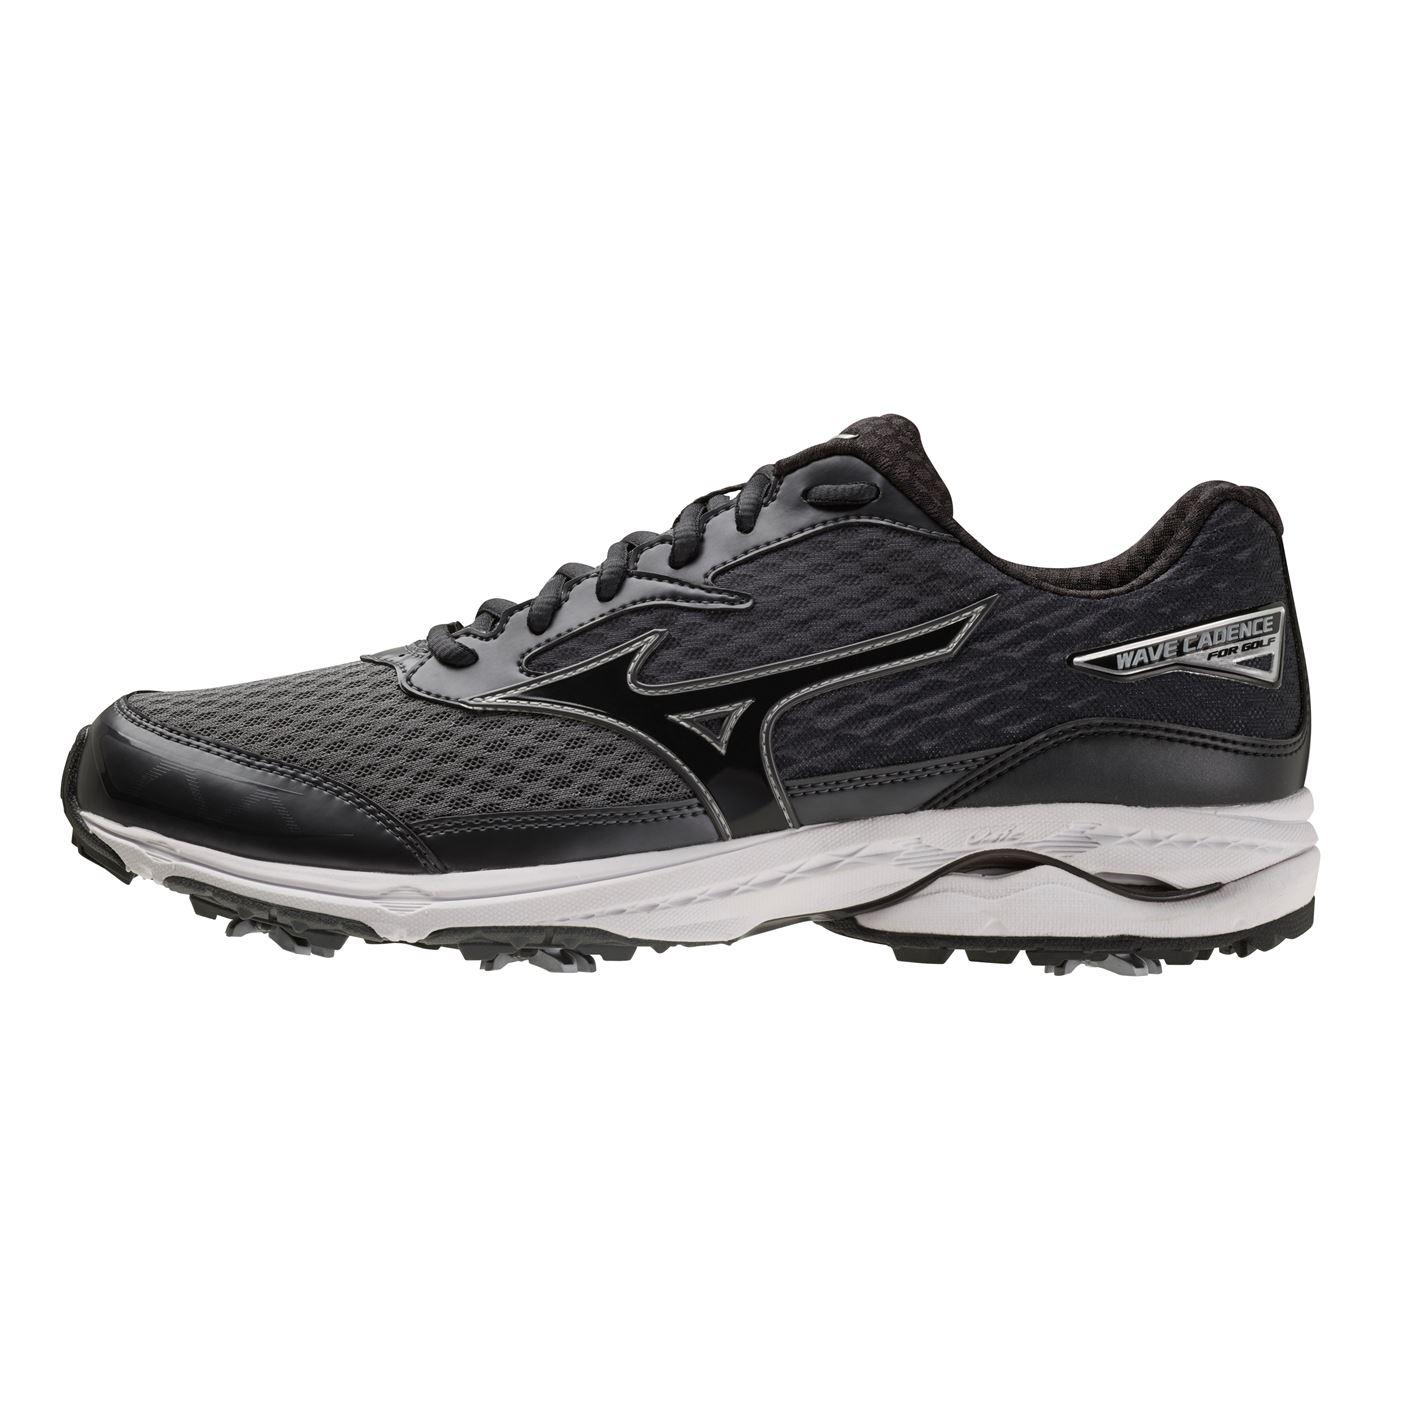 Mizuno Wave Cadence Golf Shoes Mens